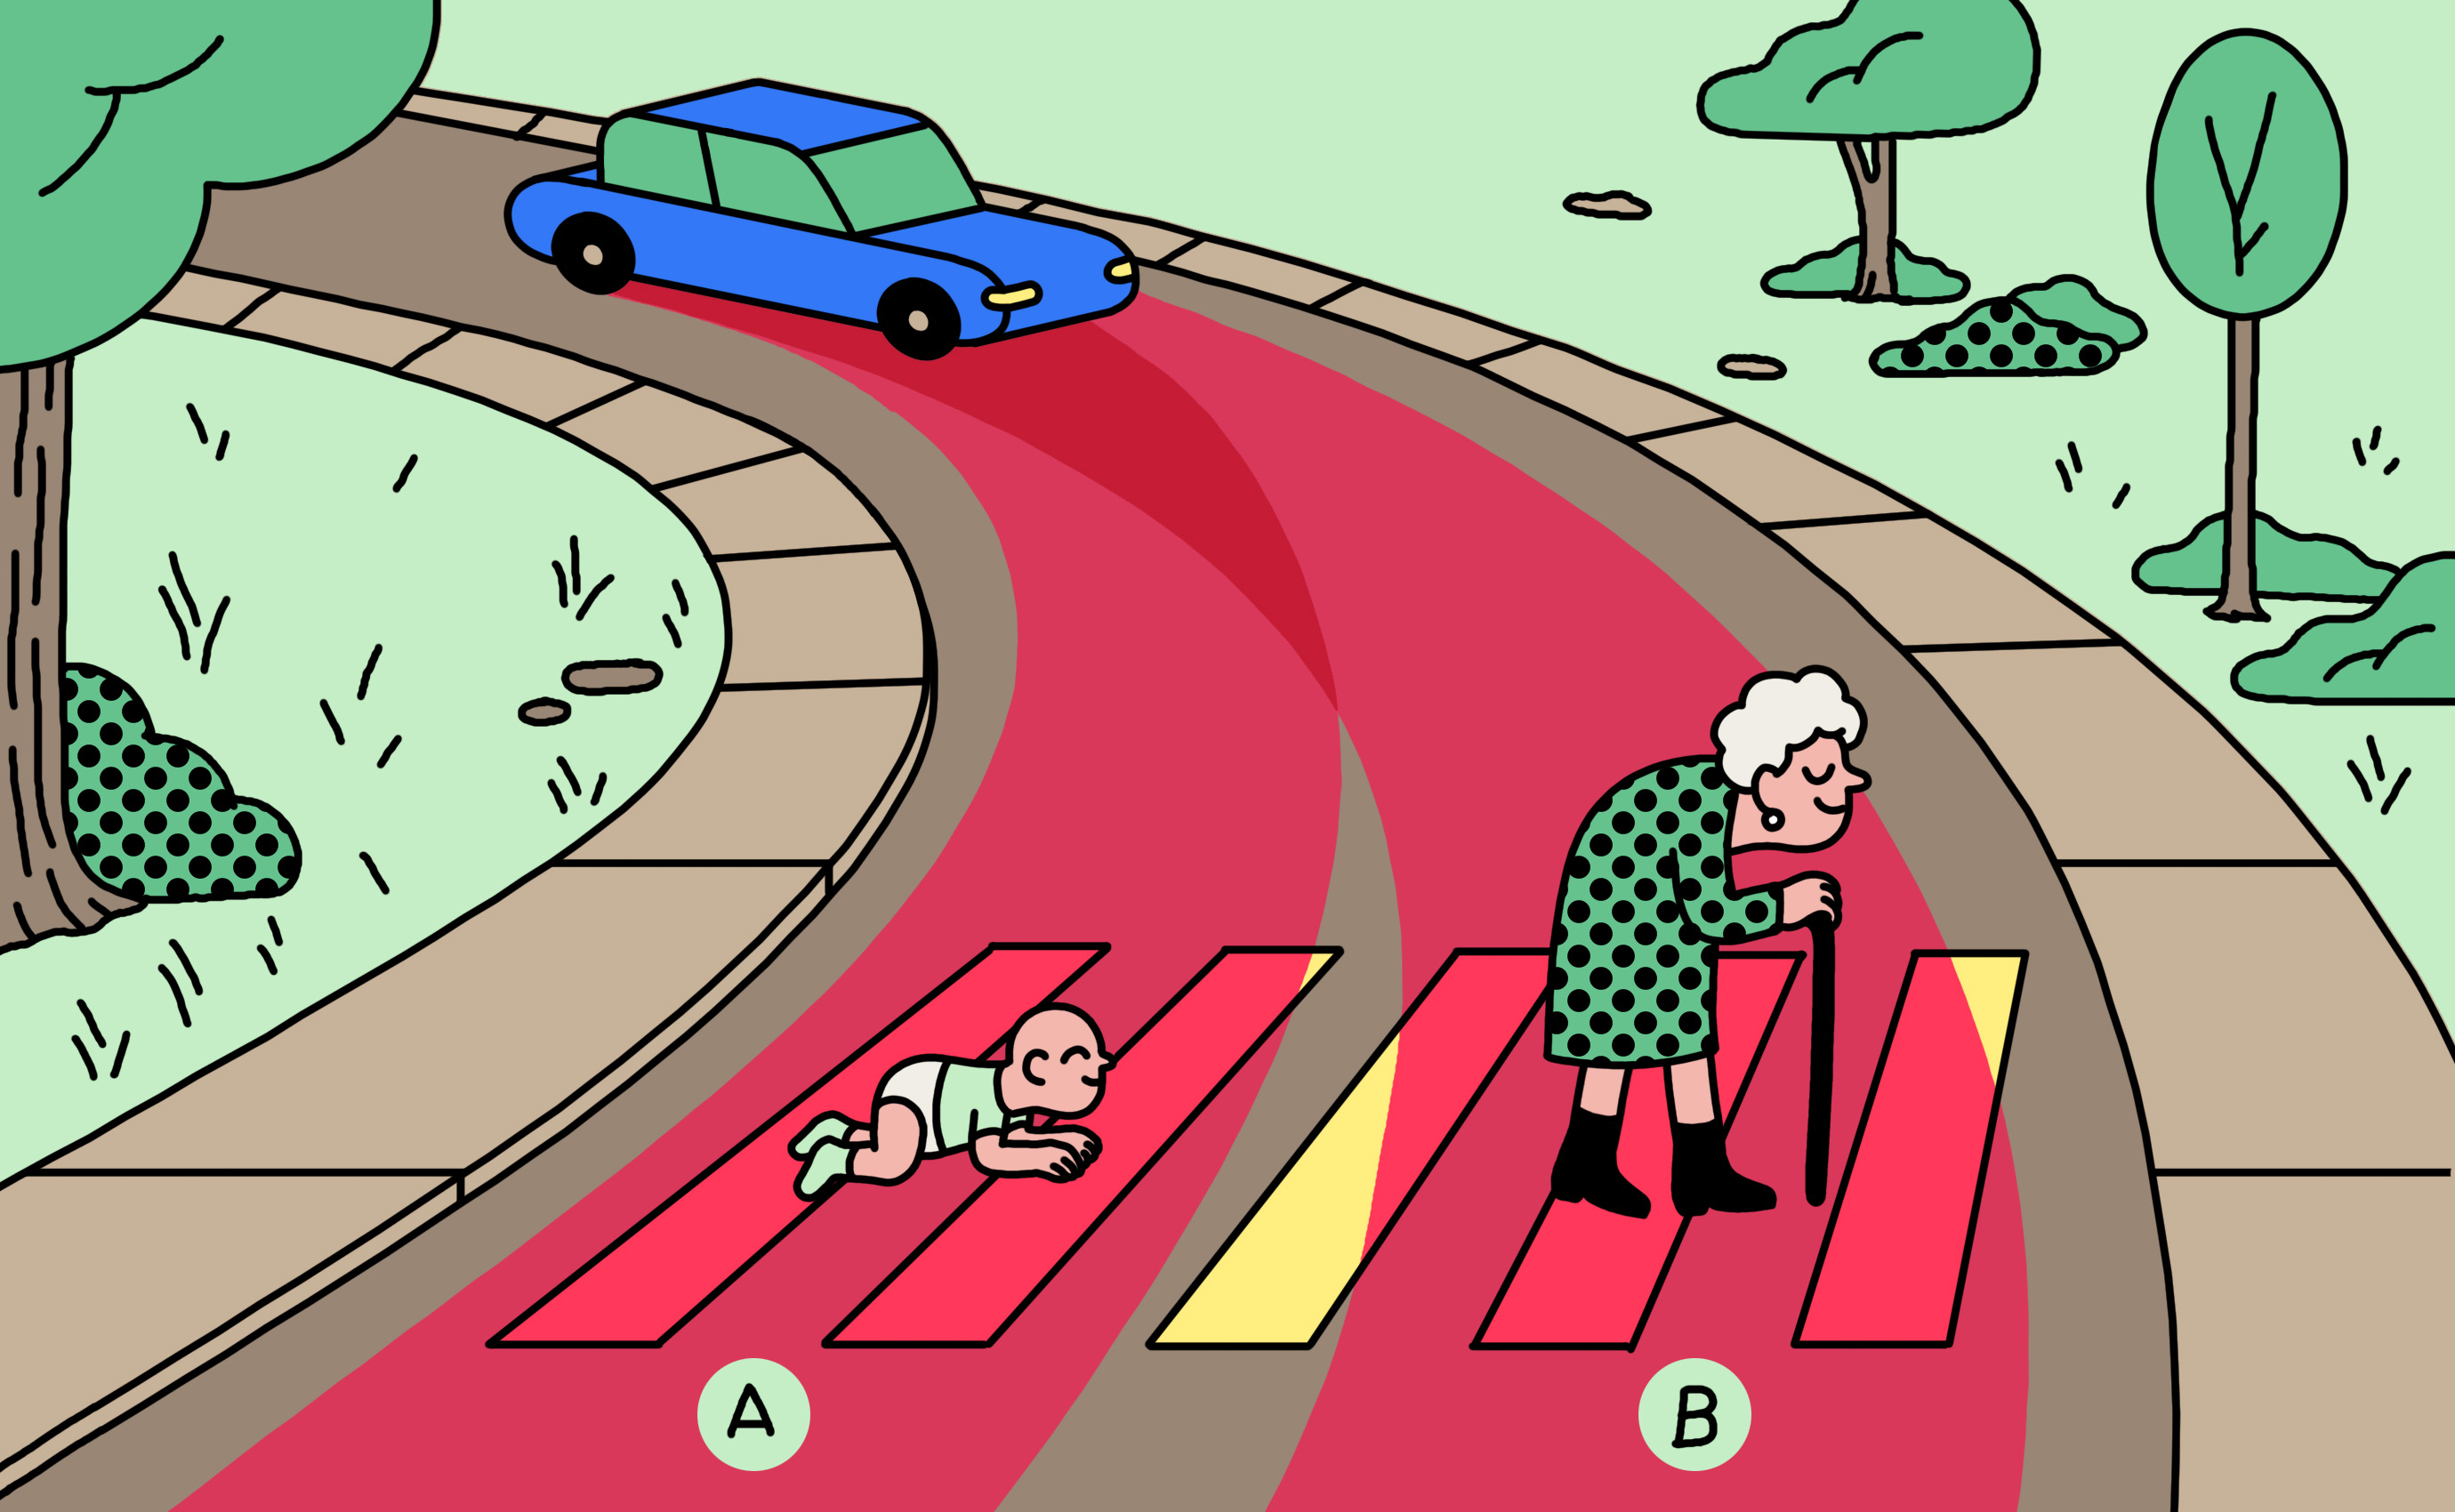 Should a self-driving car kill the baby or the grandma